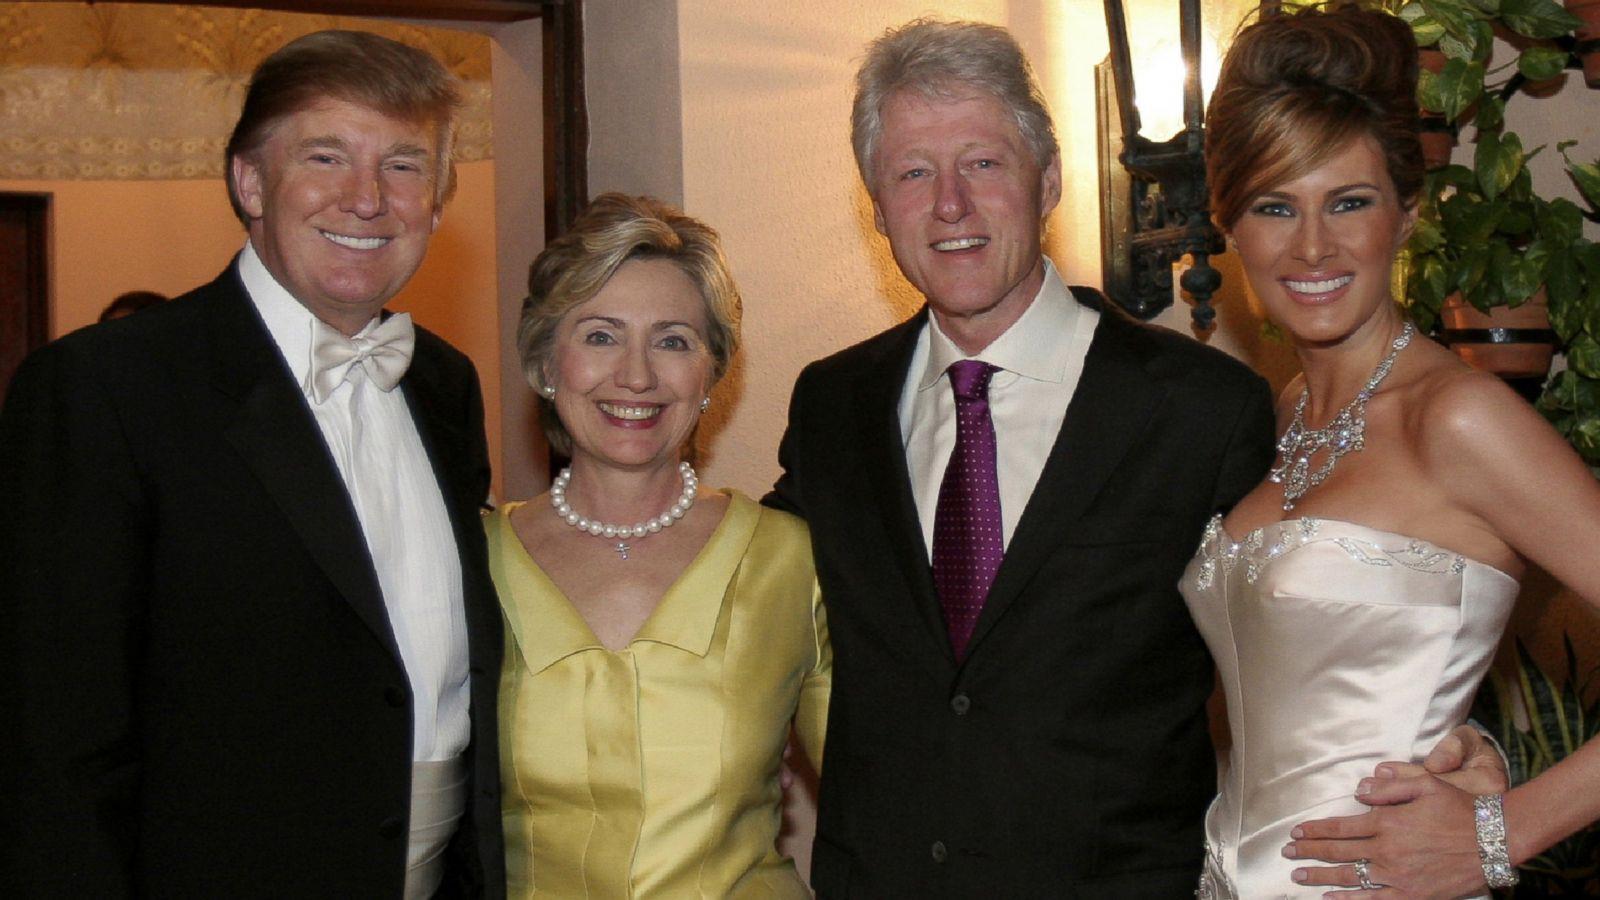 Donald Trump Says His Money Drew Hillary Clinton to His Wedding - ABC News